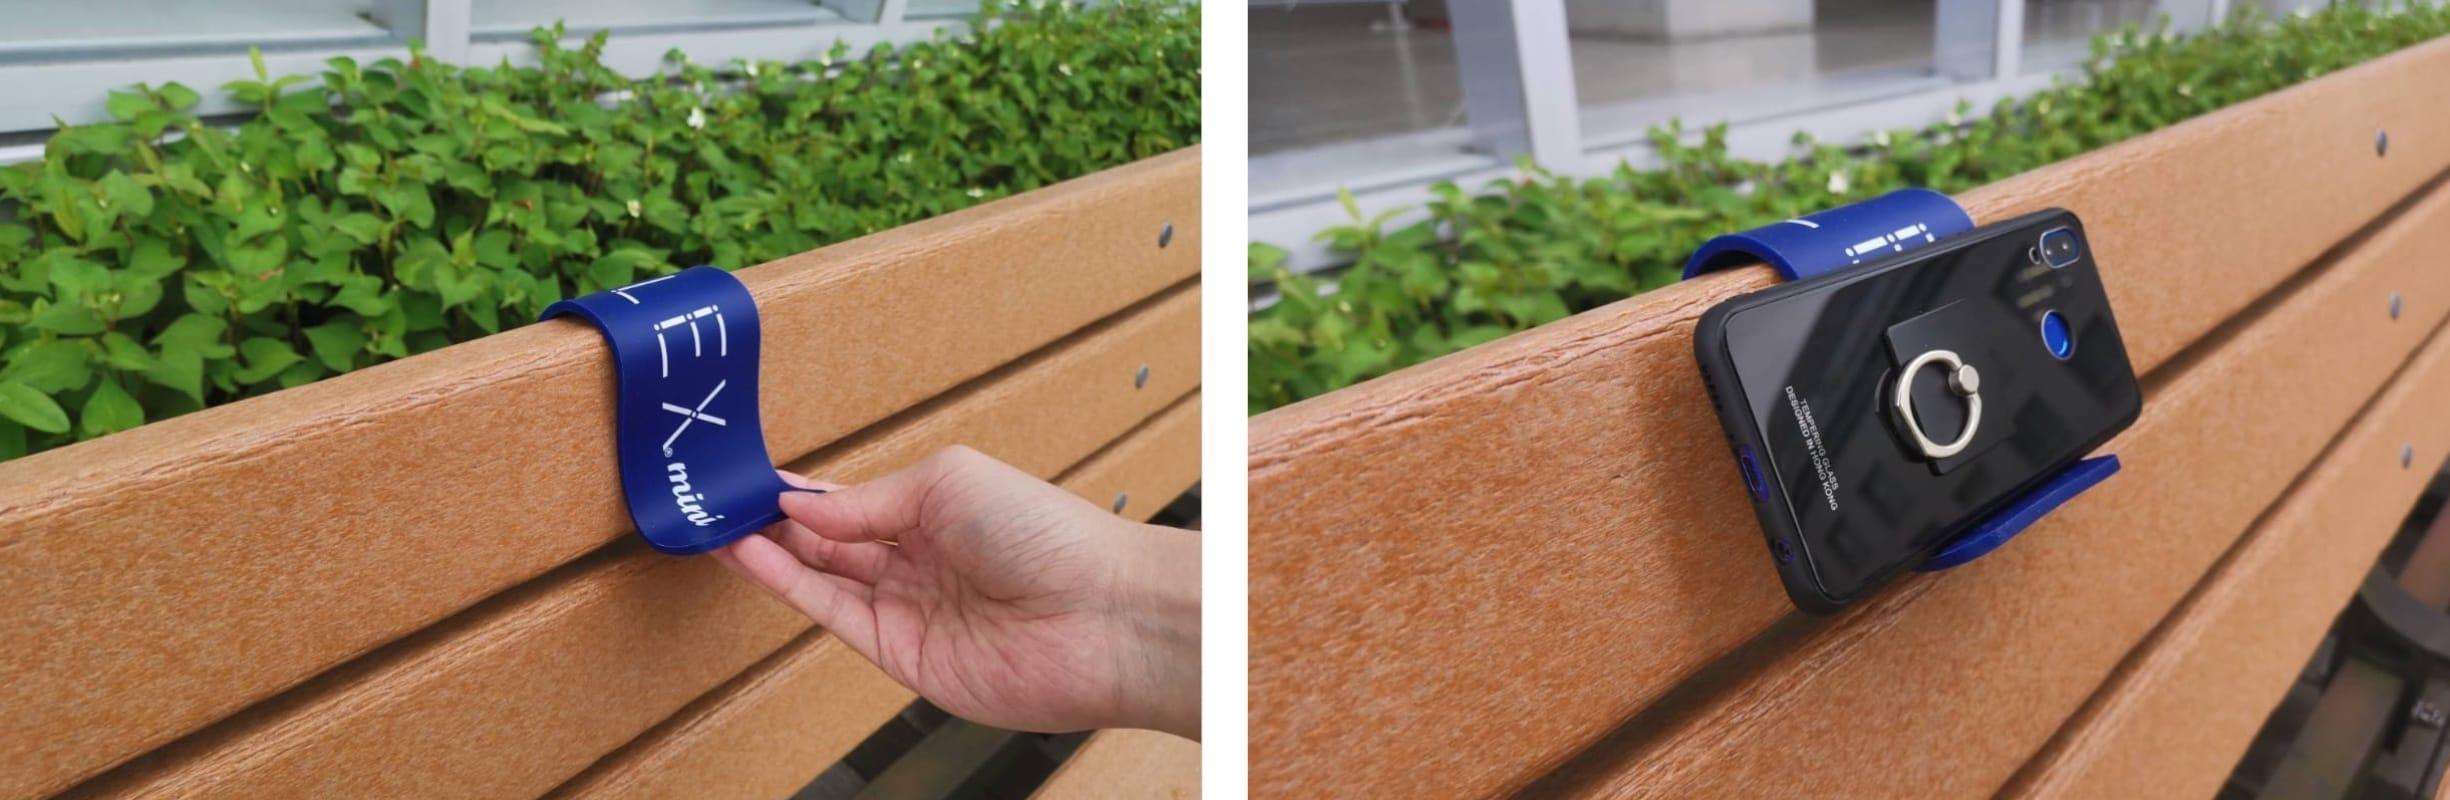 iFLEX miniをベンチに設置